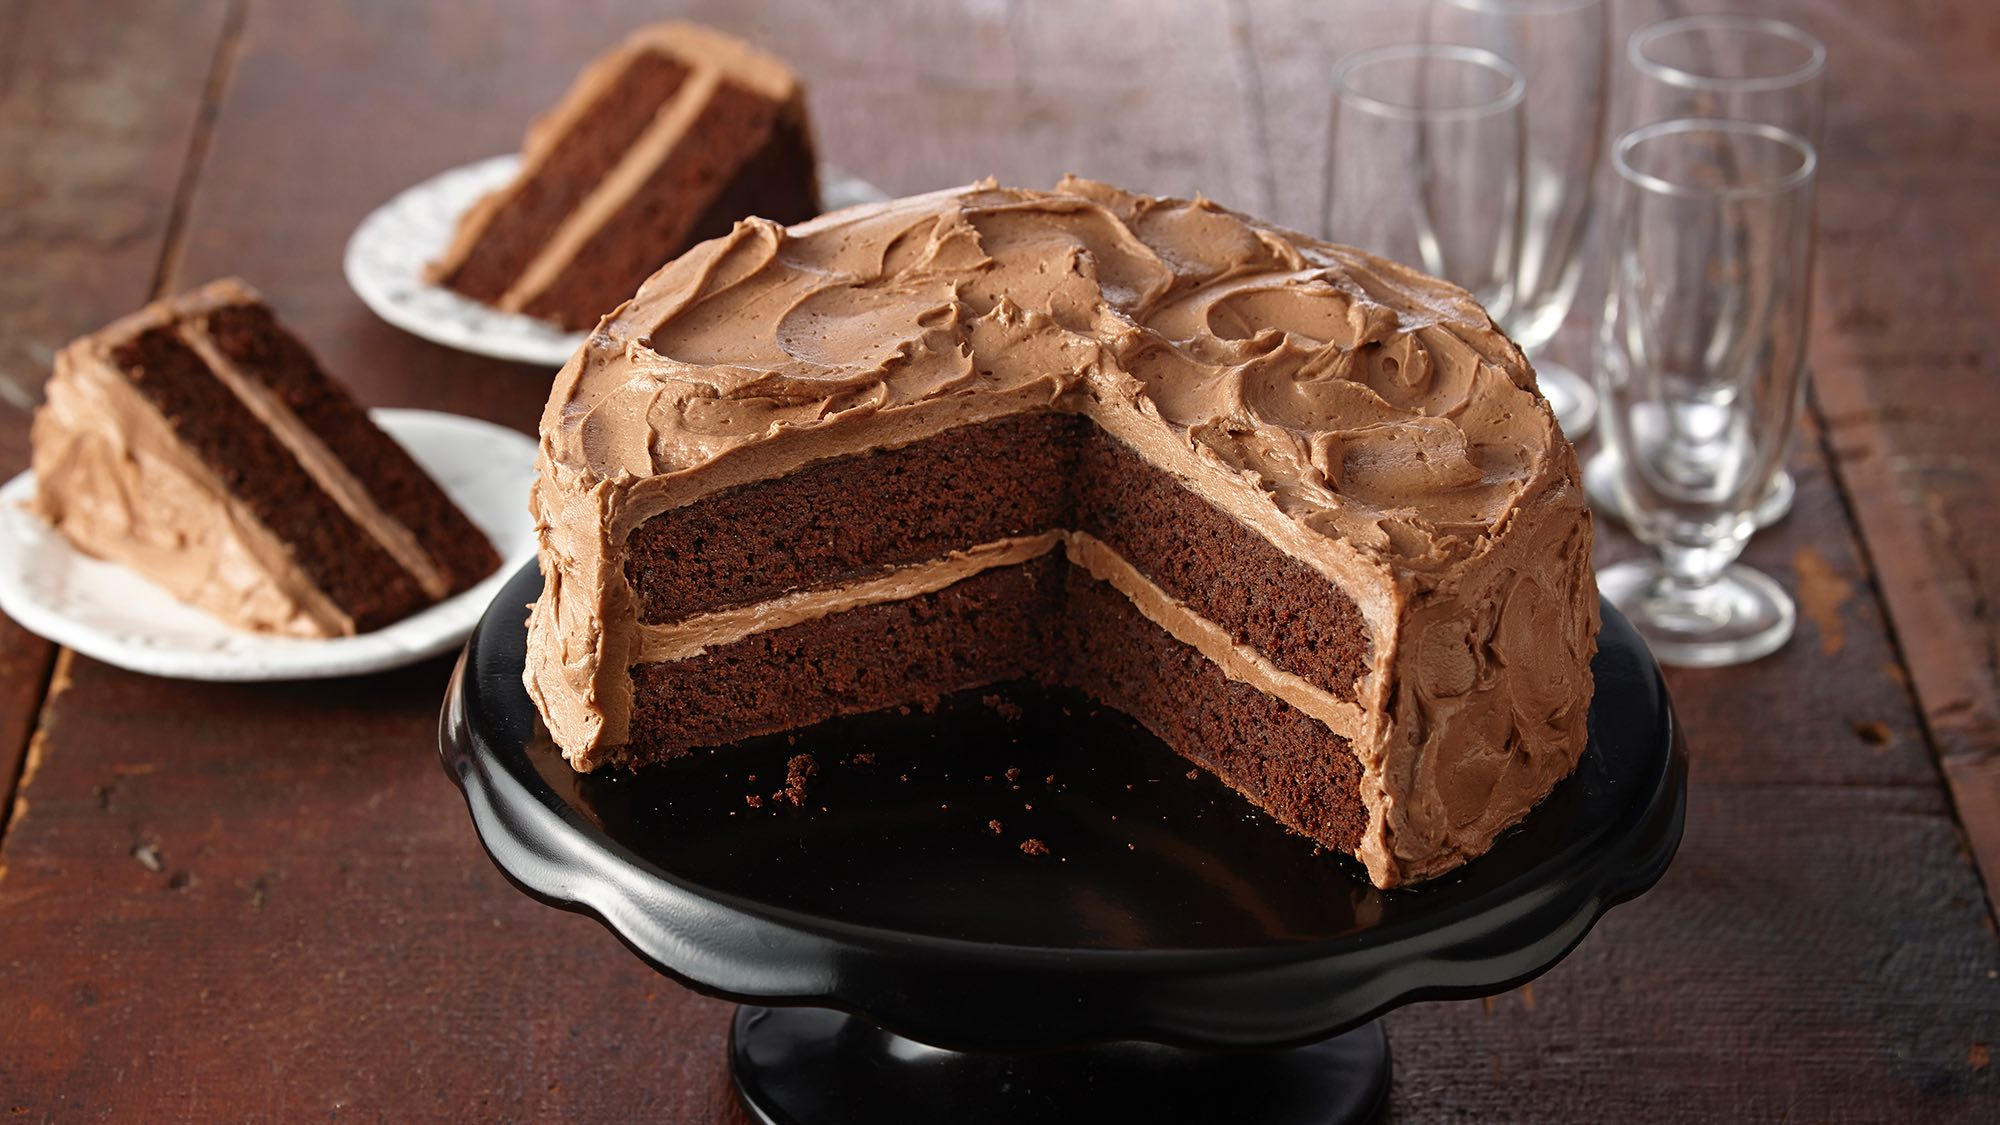 gluten-free-chocolate-cake-with-chocolate-buttercream-frosting.jpg